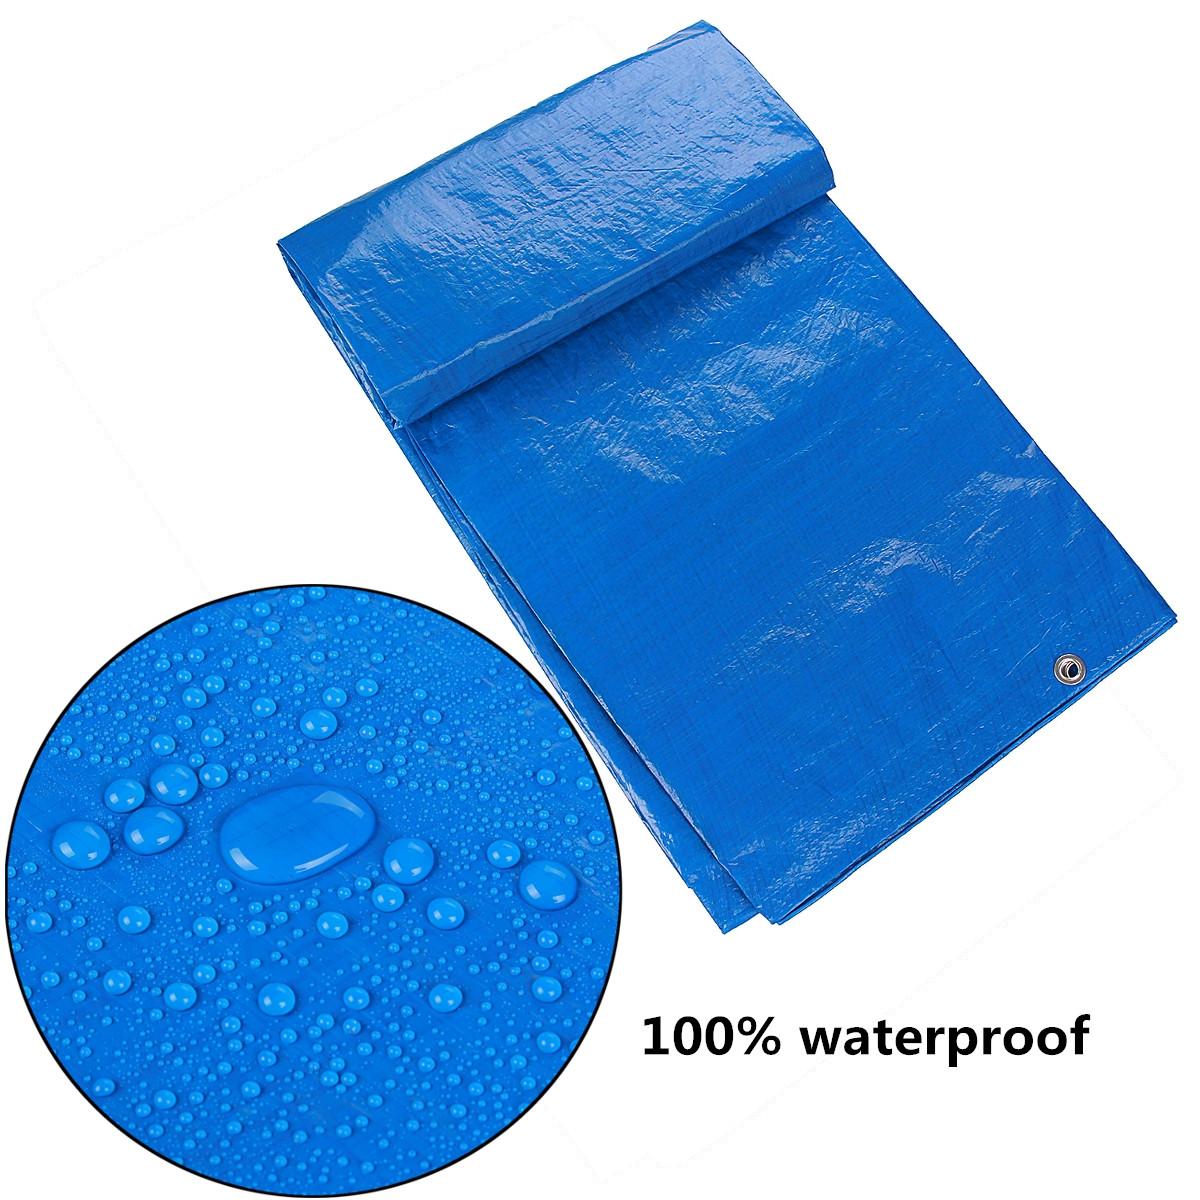 Waterproof Cover Tarpaulin Groundsheet Camping Light Weight Tarp Tarp Tarp for Car Outd... e5075e